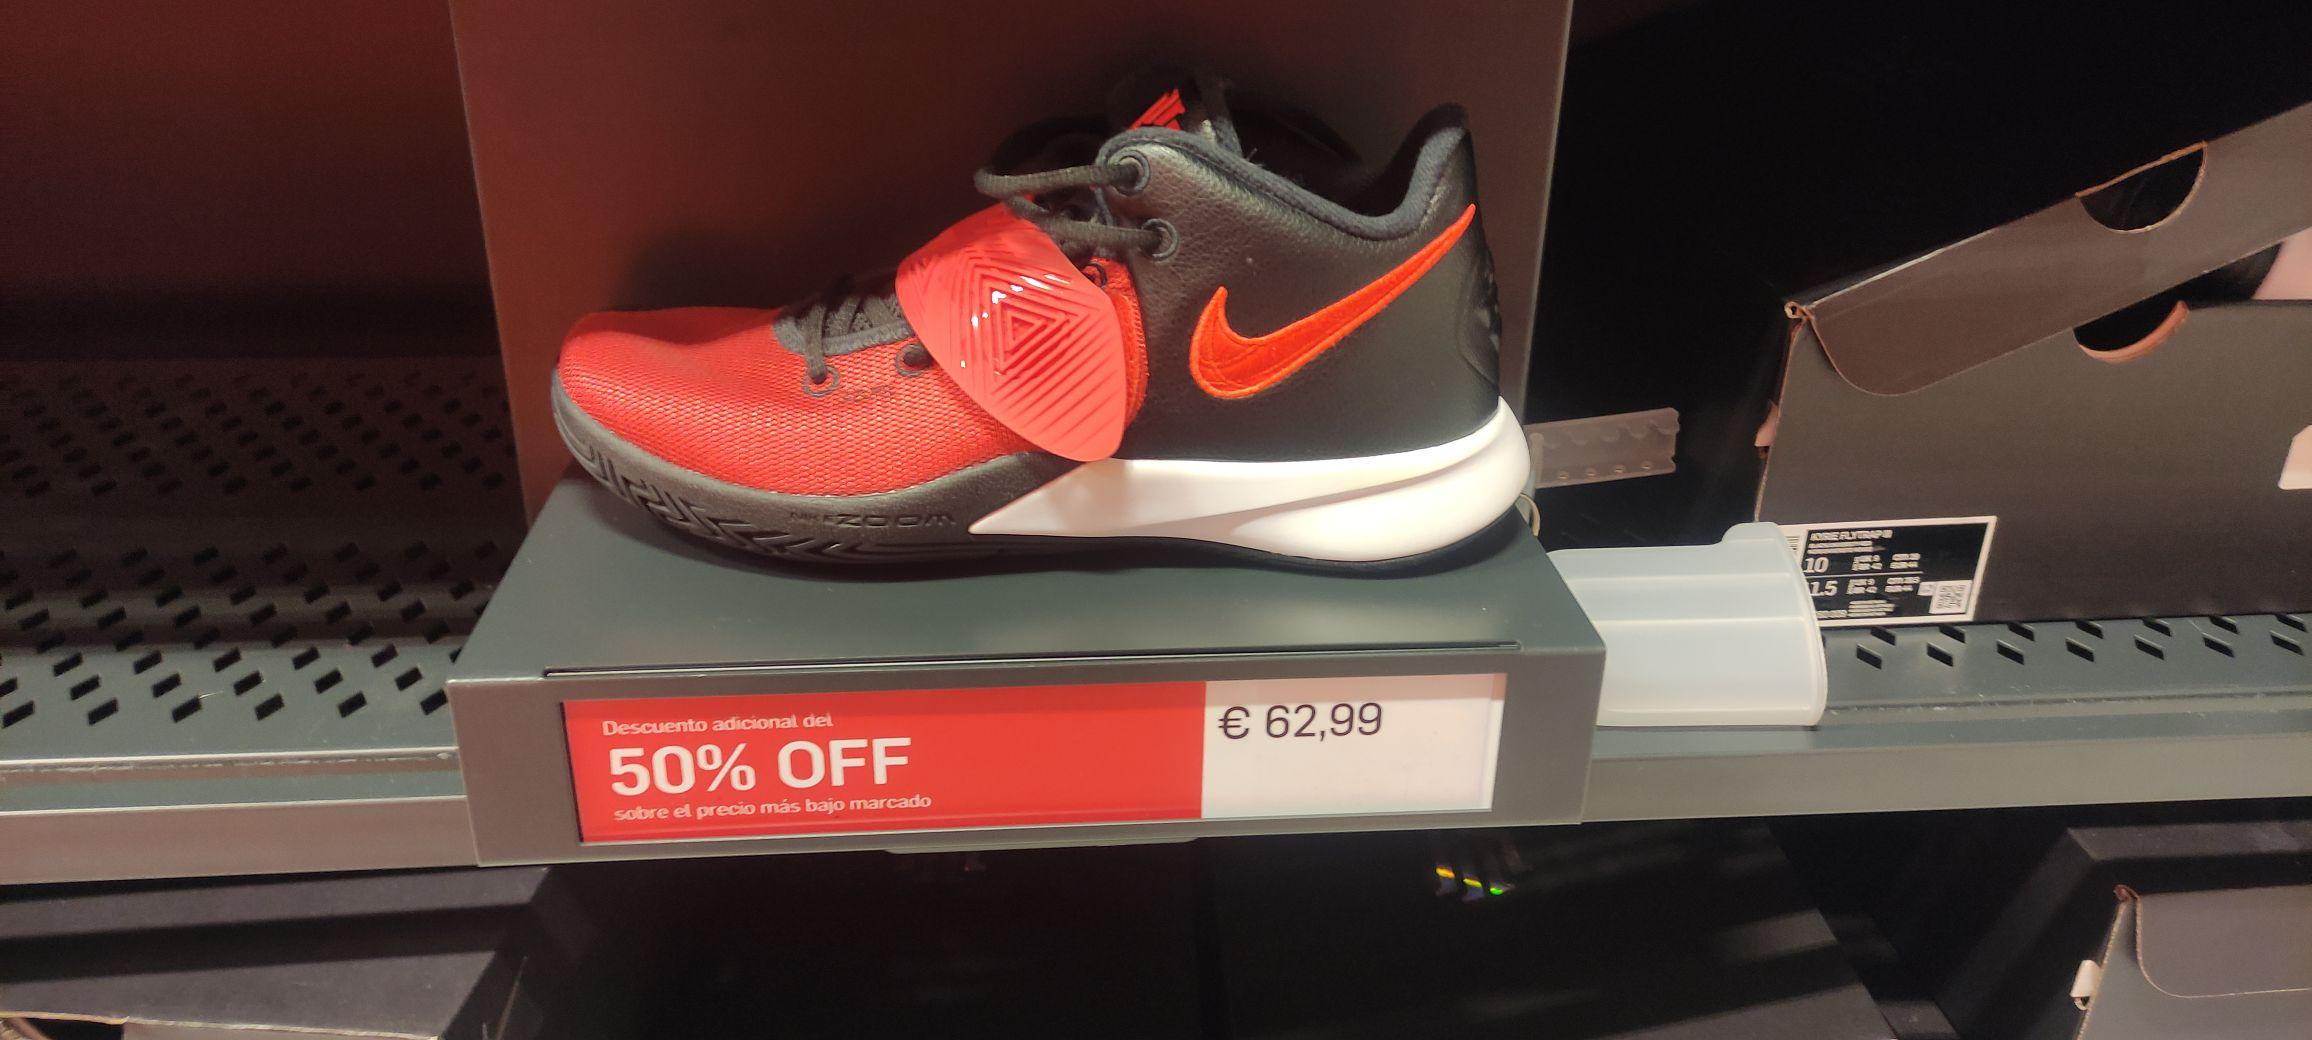 Zapatillas baloncesto Kyrie 4 Nike Nassica Getafe